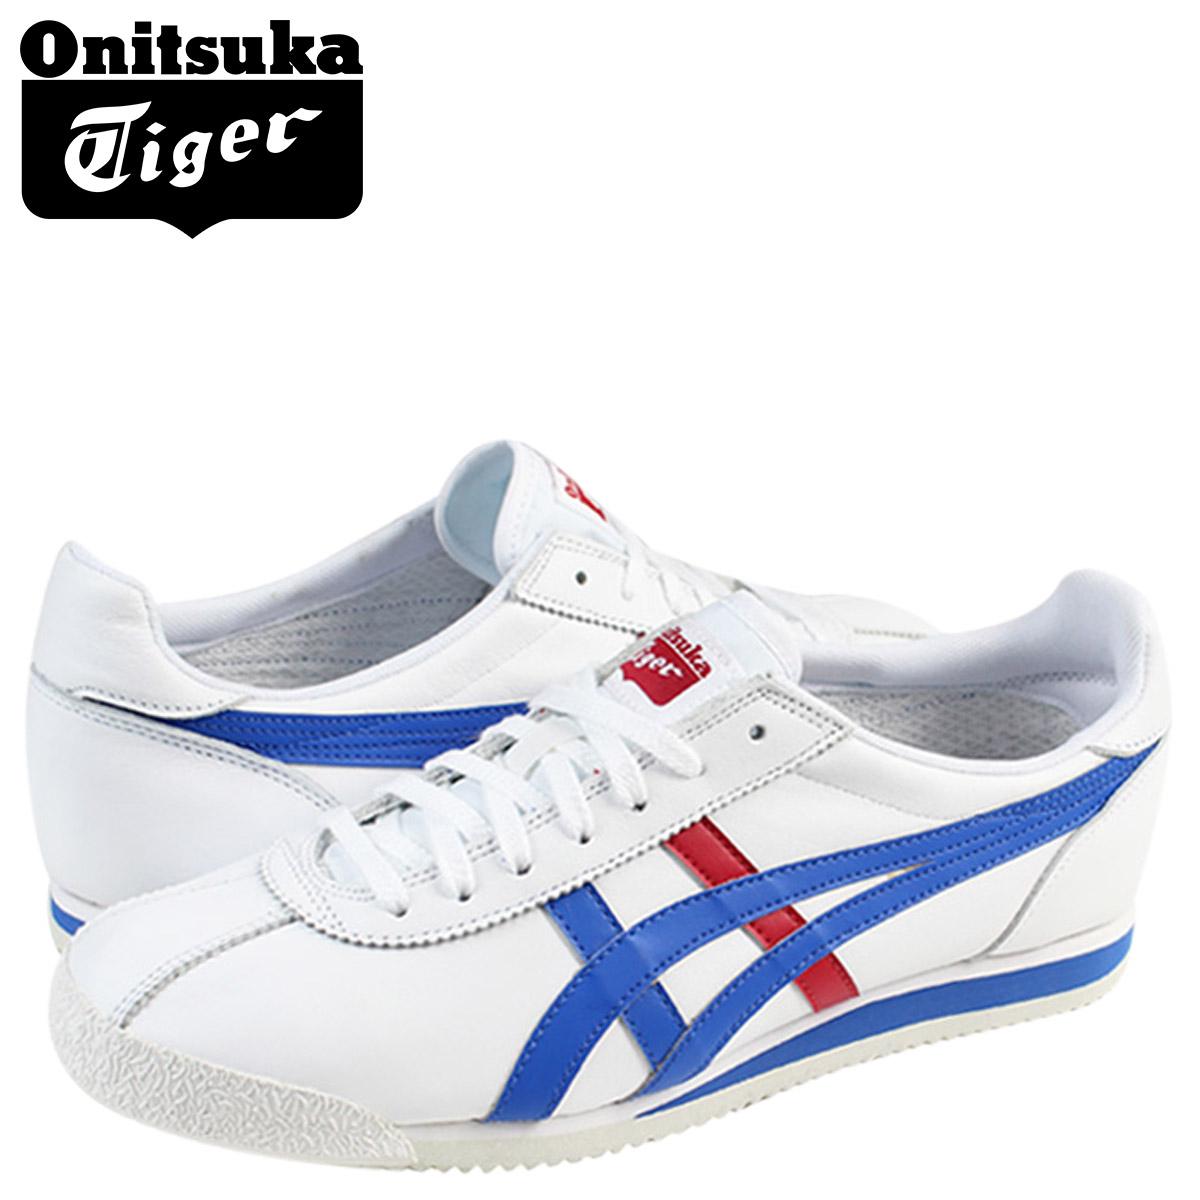 sports shoes e33d4 5e84a Onitsuka tiger ASICS Onitsuka Tiger asics CORSAIR TH319L-0142 sneakers  Corsair leather men